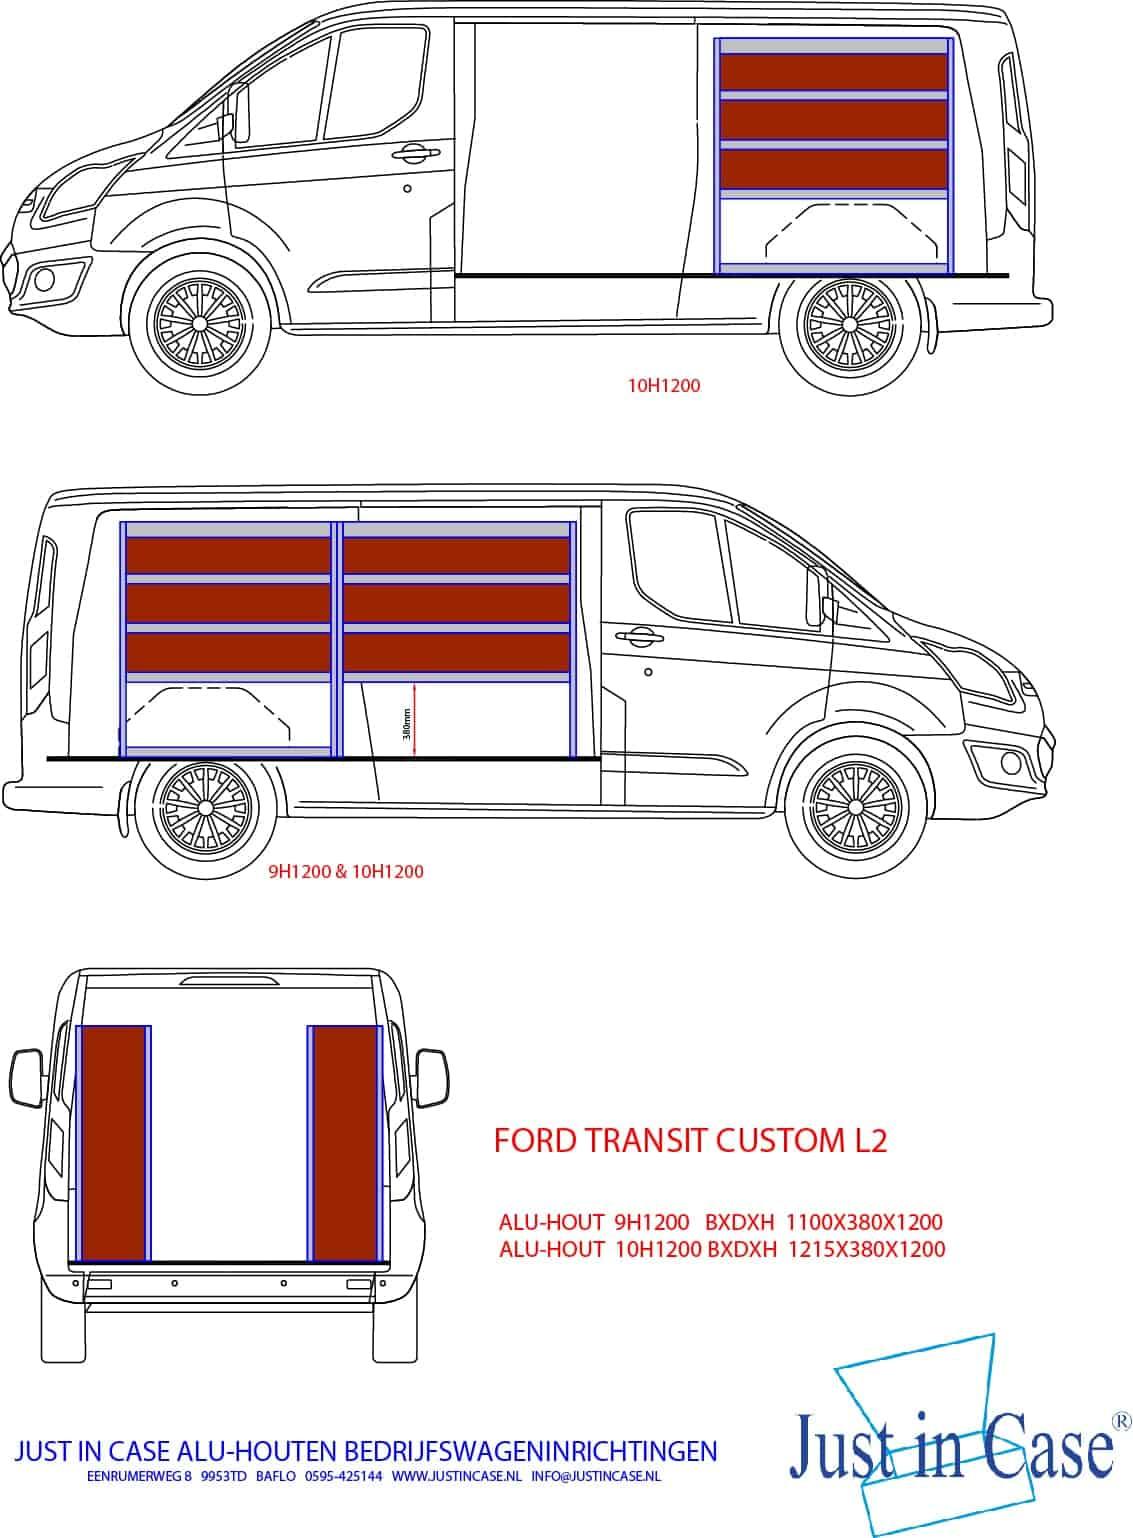 Ford Transit Custom bedrijfsbus inrichting